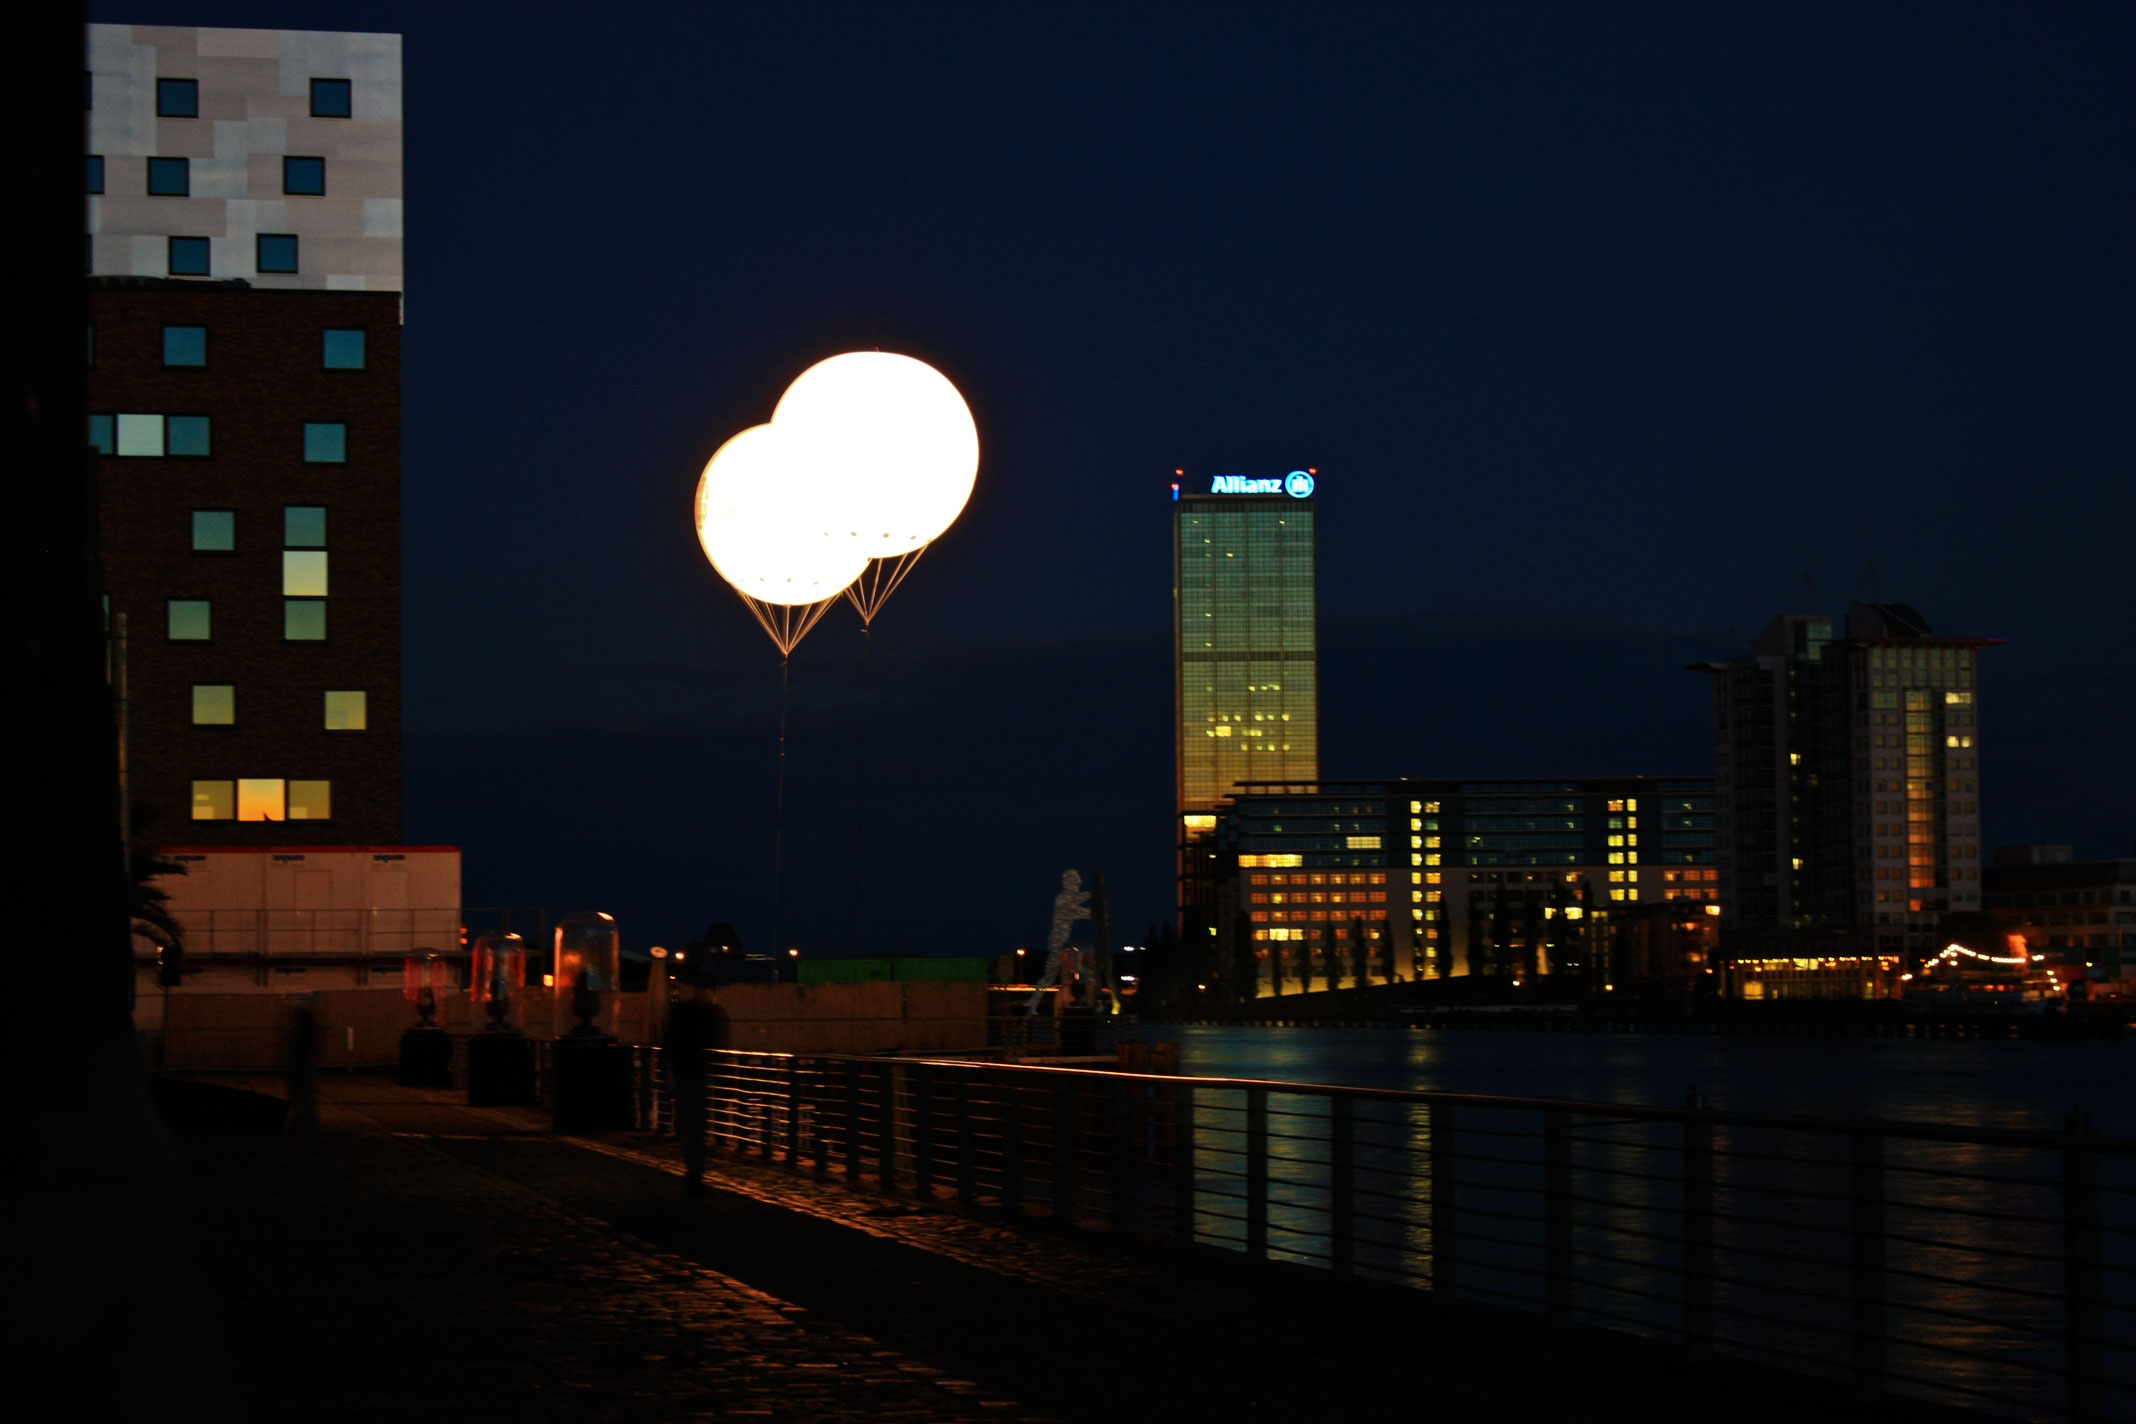 Leuchtballons-Helium